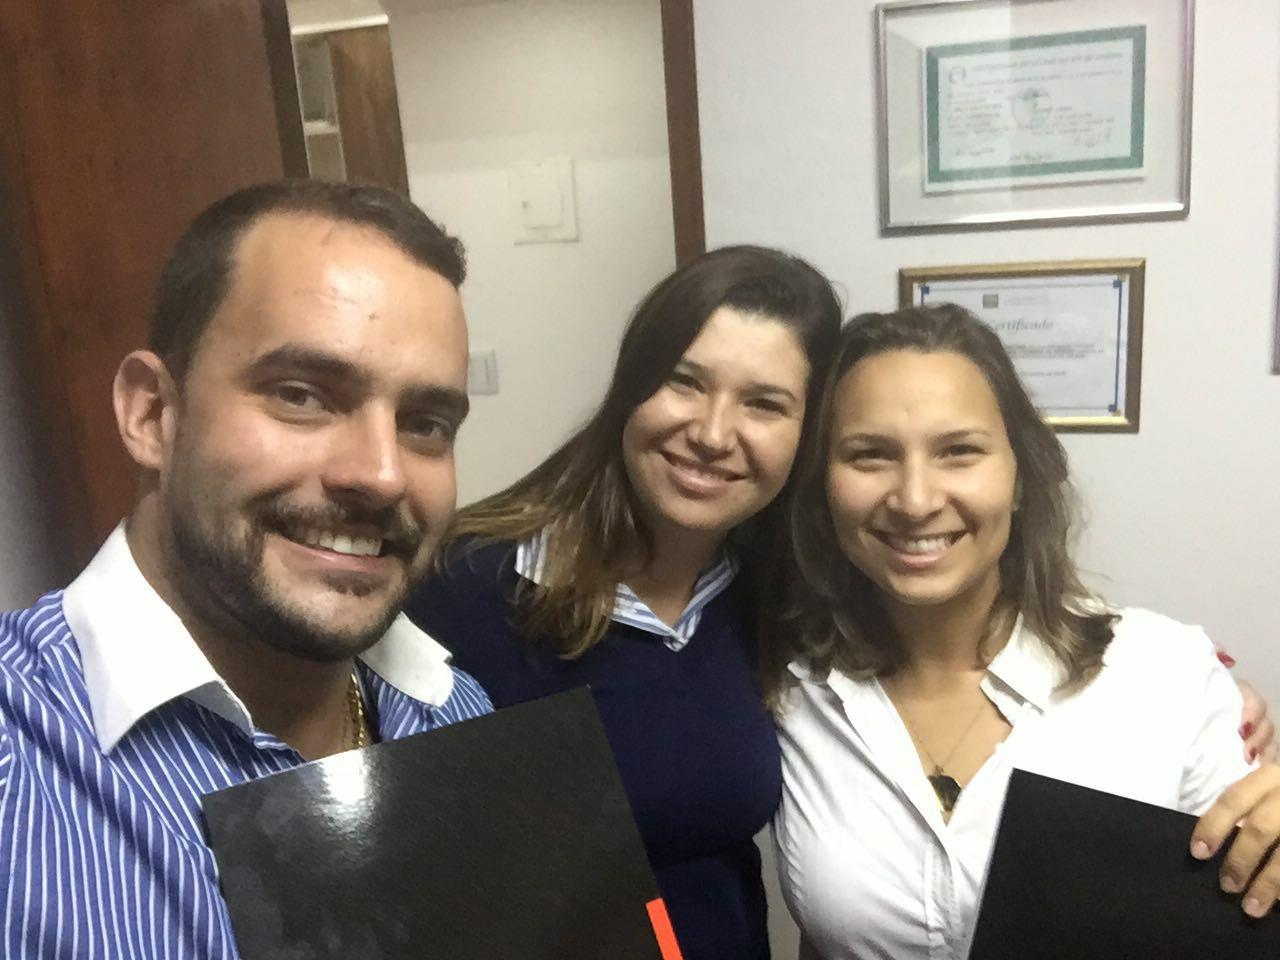 DRS. THOMAS BERNARDES, CRISTIANE AZEVEDO E MAYRA SANTANA, NESTA ORDEM